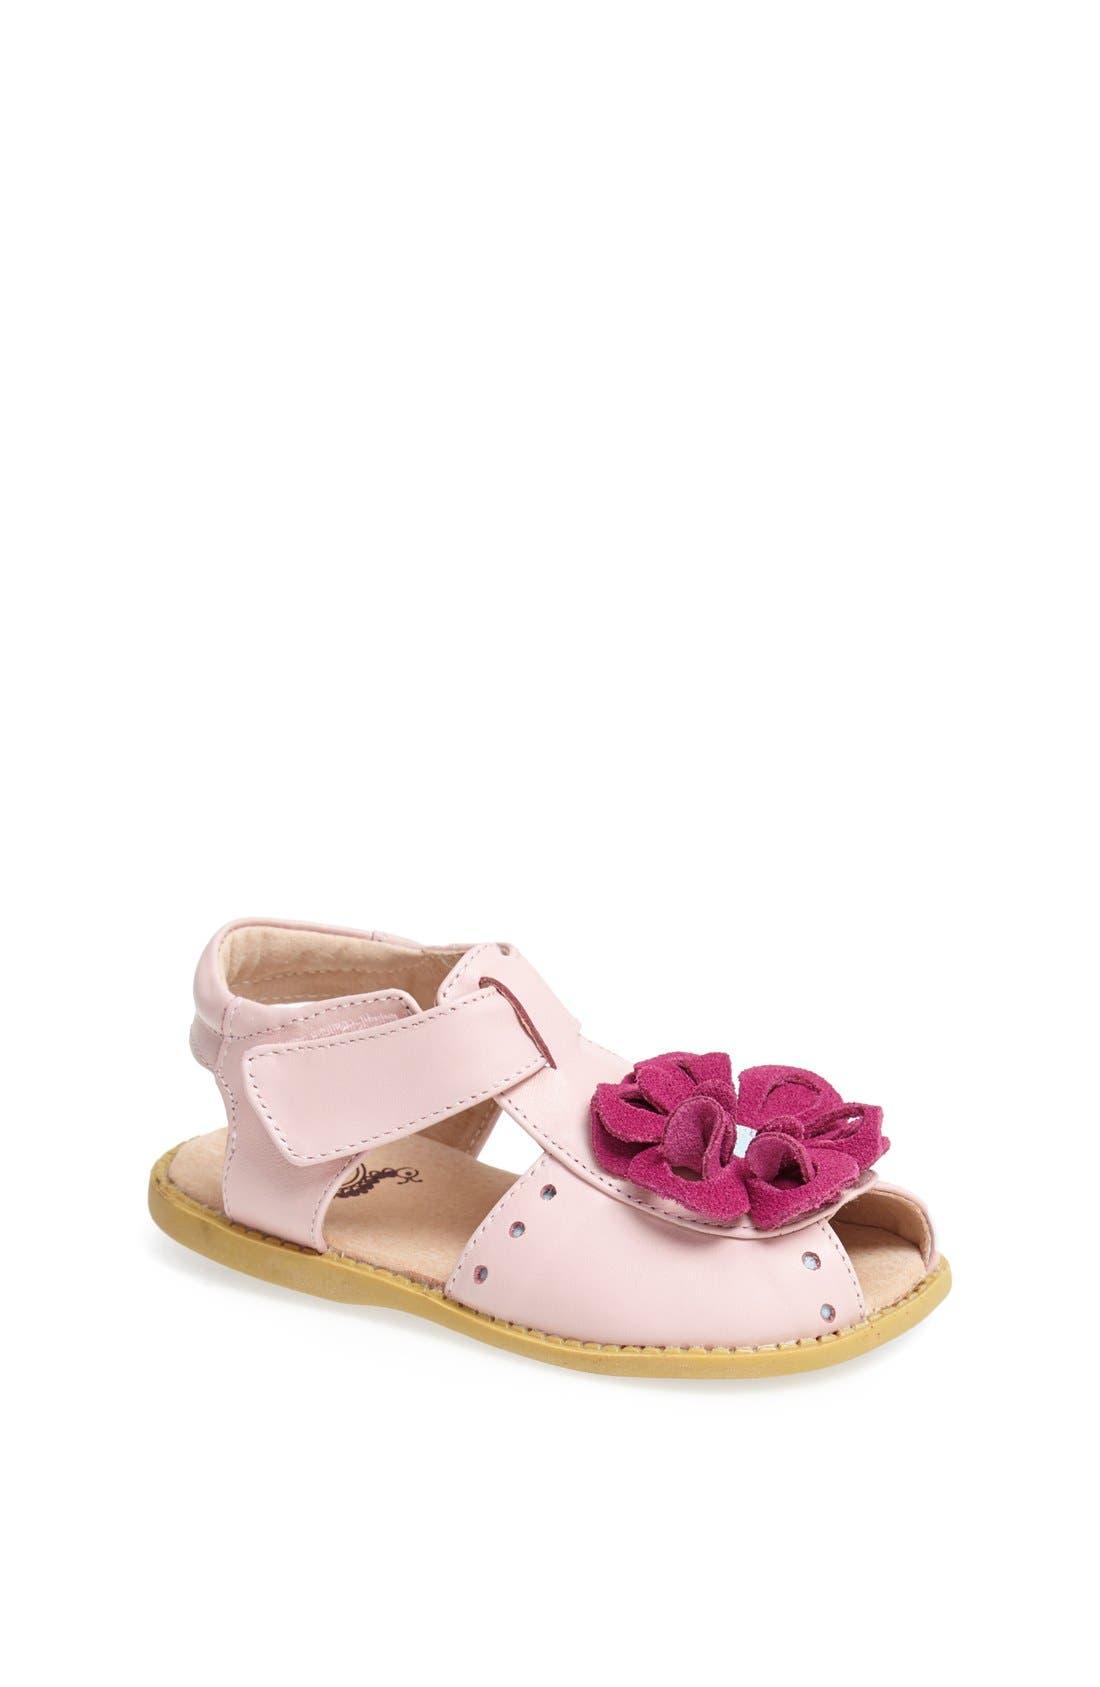 Alternate Image 1 Selected - Livie & Luca 'Bloom' Sandal (Baby, Walker & Toddler)